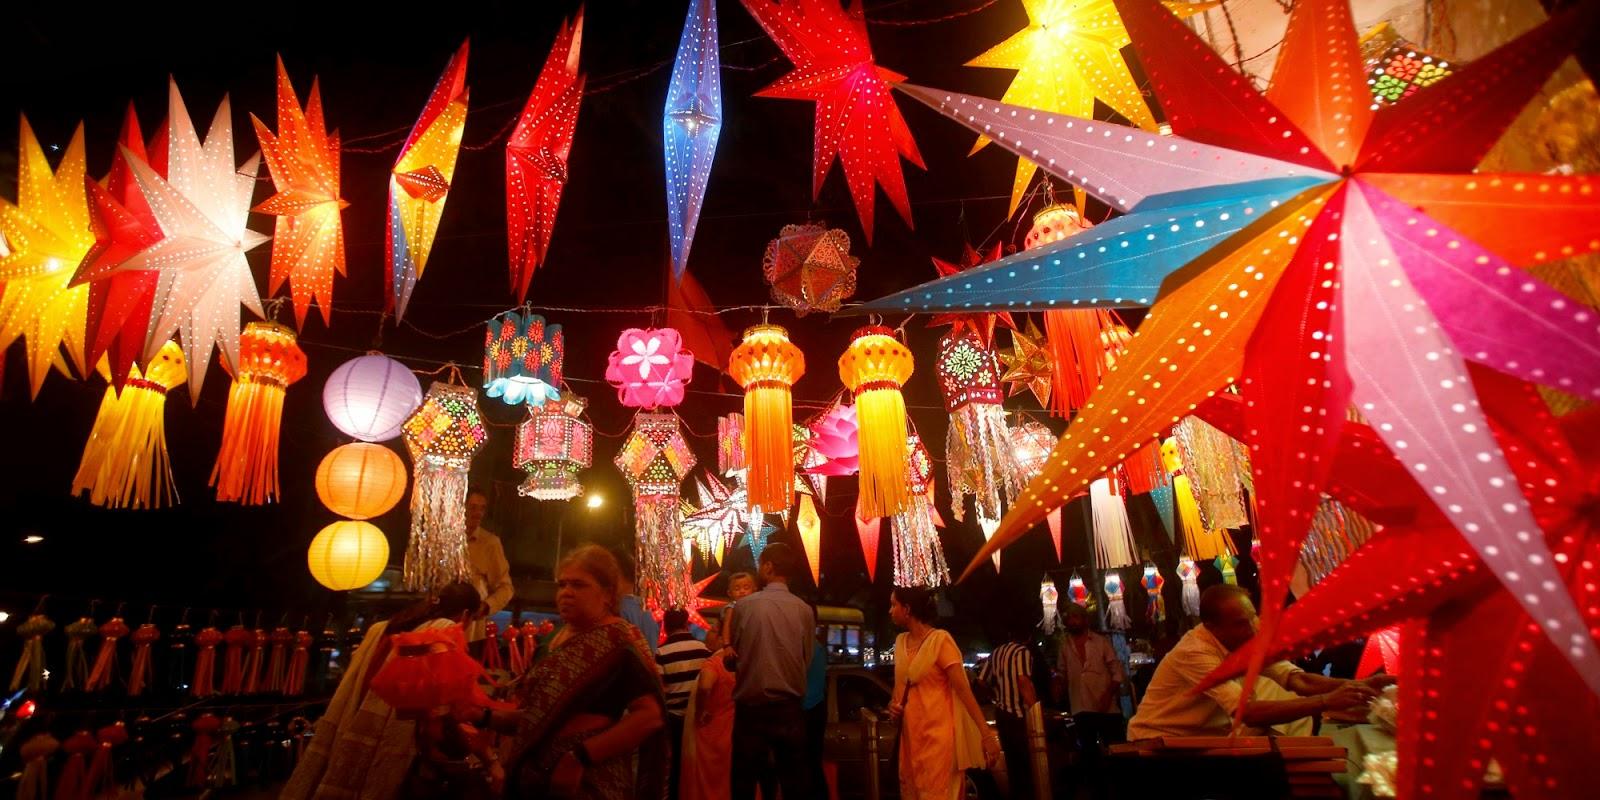 diwali decoration image